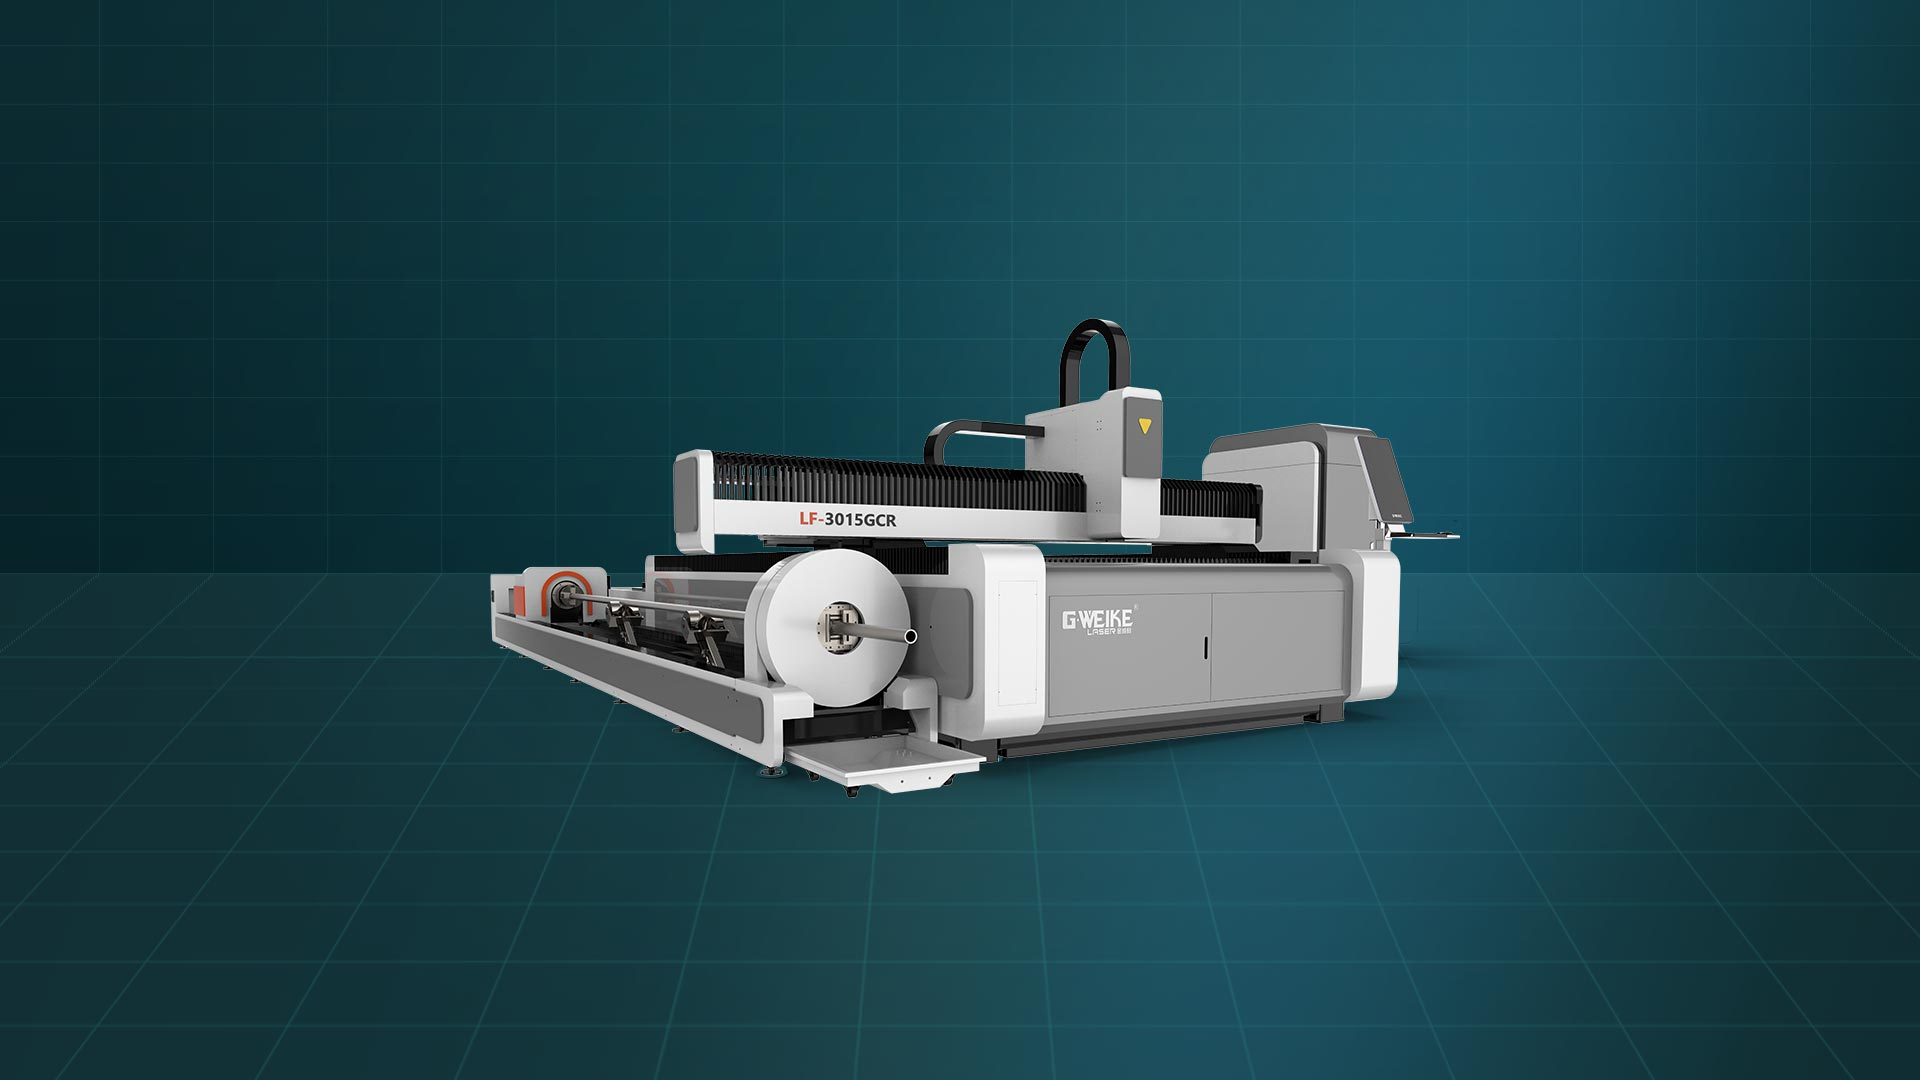 Máy cắt laser fiber LF-3015GCR